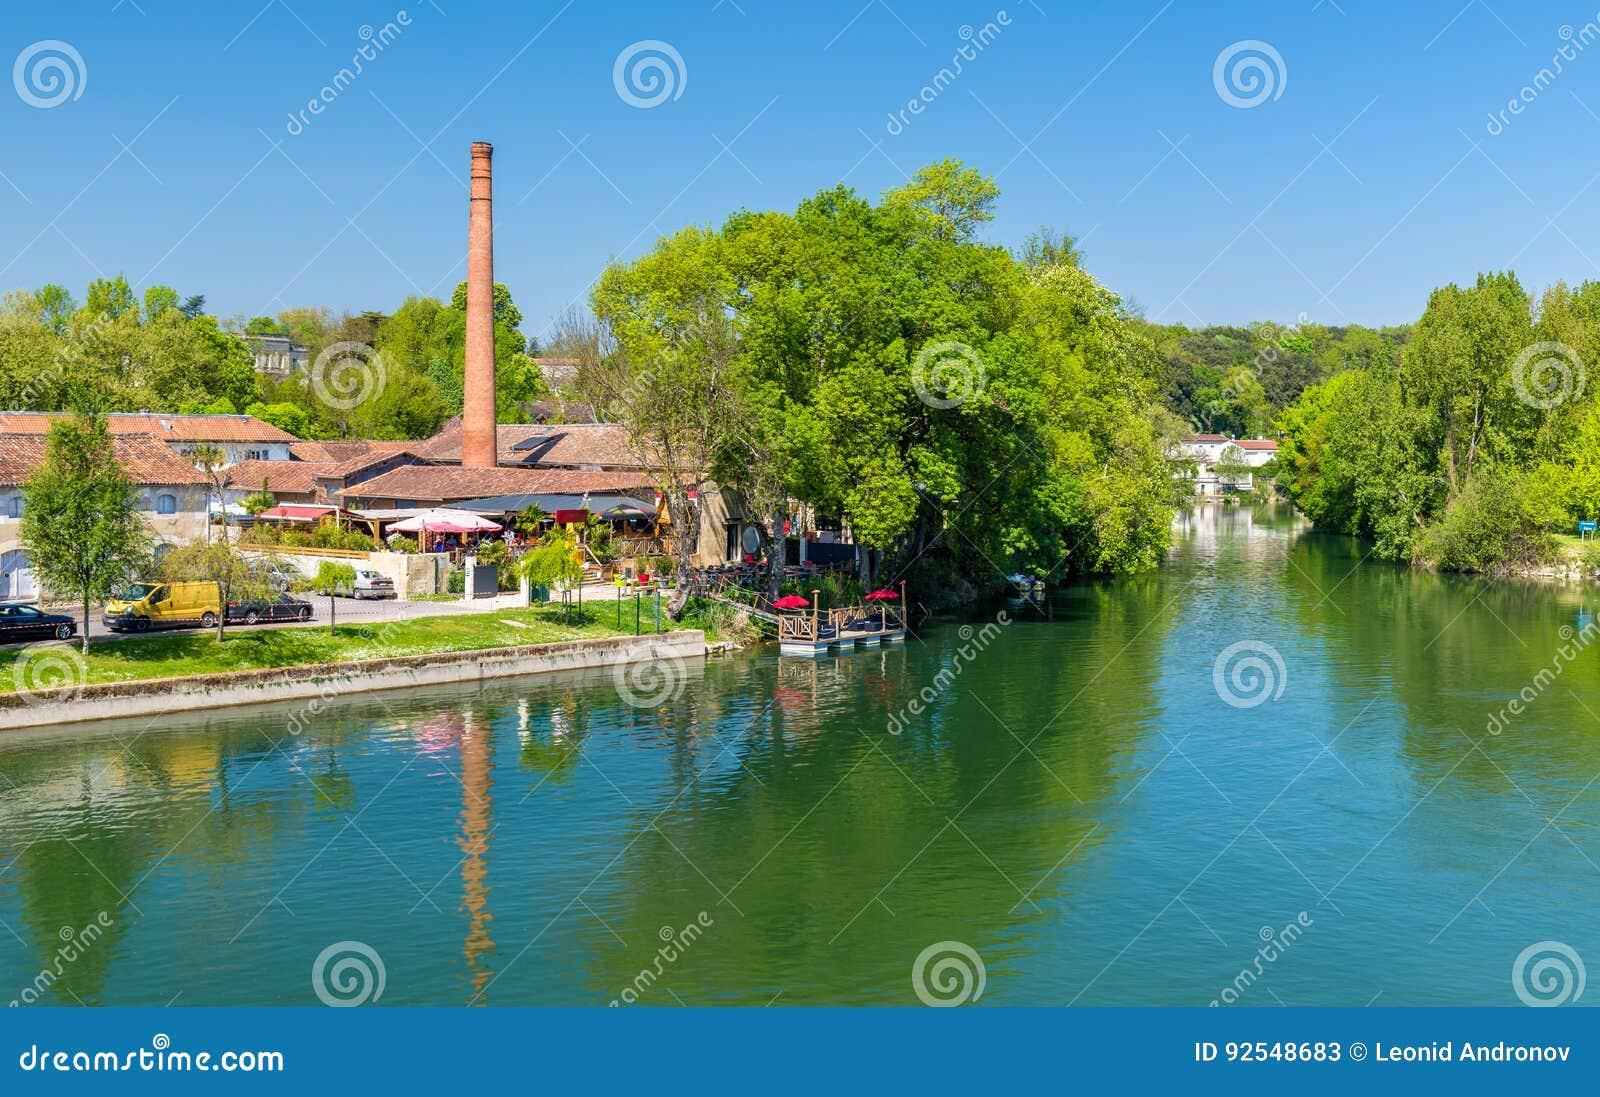 Malerische Landschaft des Charente-Flusses am Kognak, Frankreich